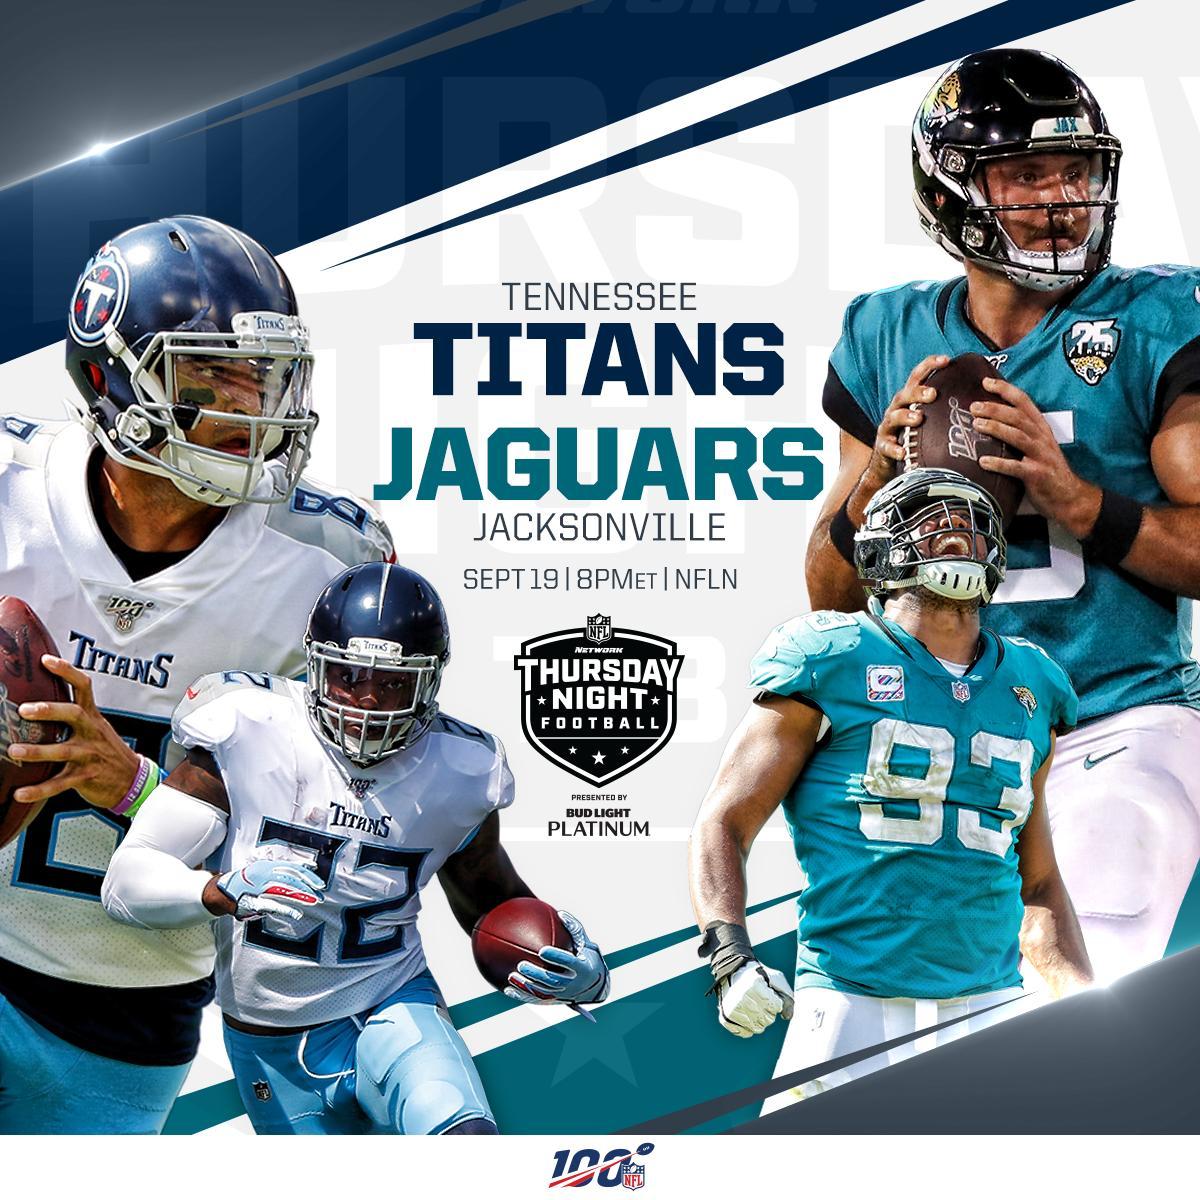 UP NEXT: @Titans vs. @Jaguars on #TNF! #Titans #DUUUVAL 📺: #TENvsJAX   Thursday 8pm ET on @nflnetwork 📱: NFL app // Yahoo Sports app